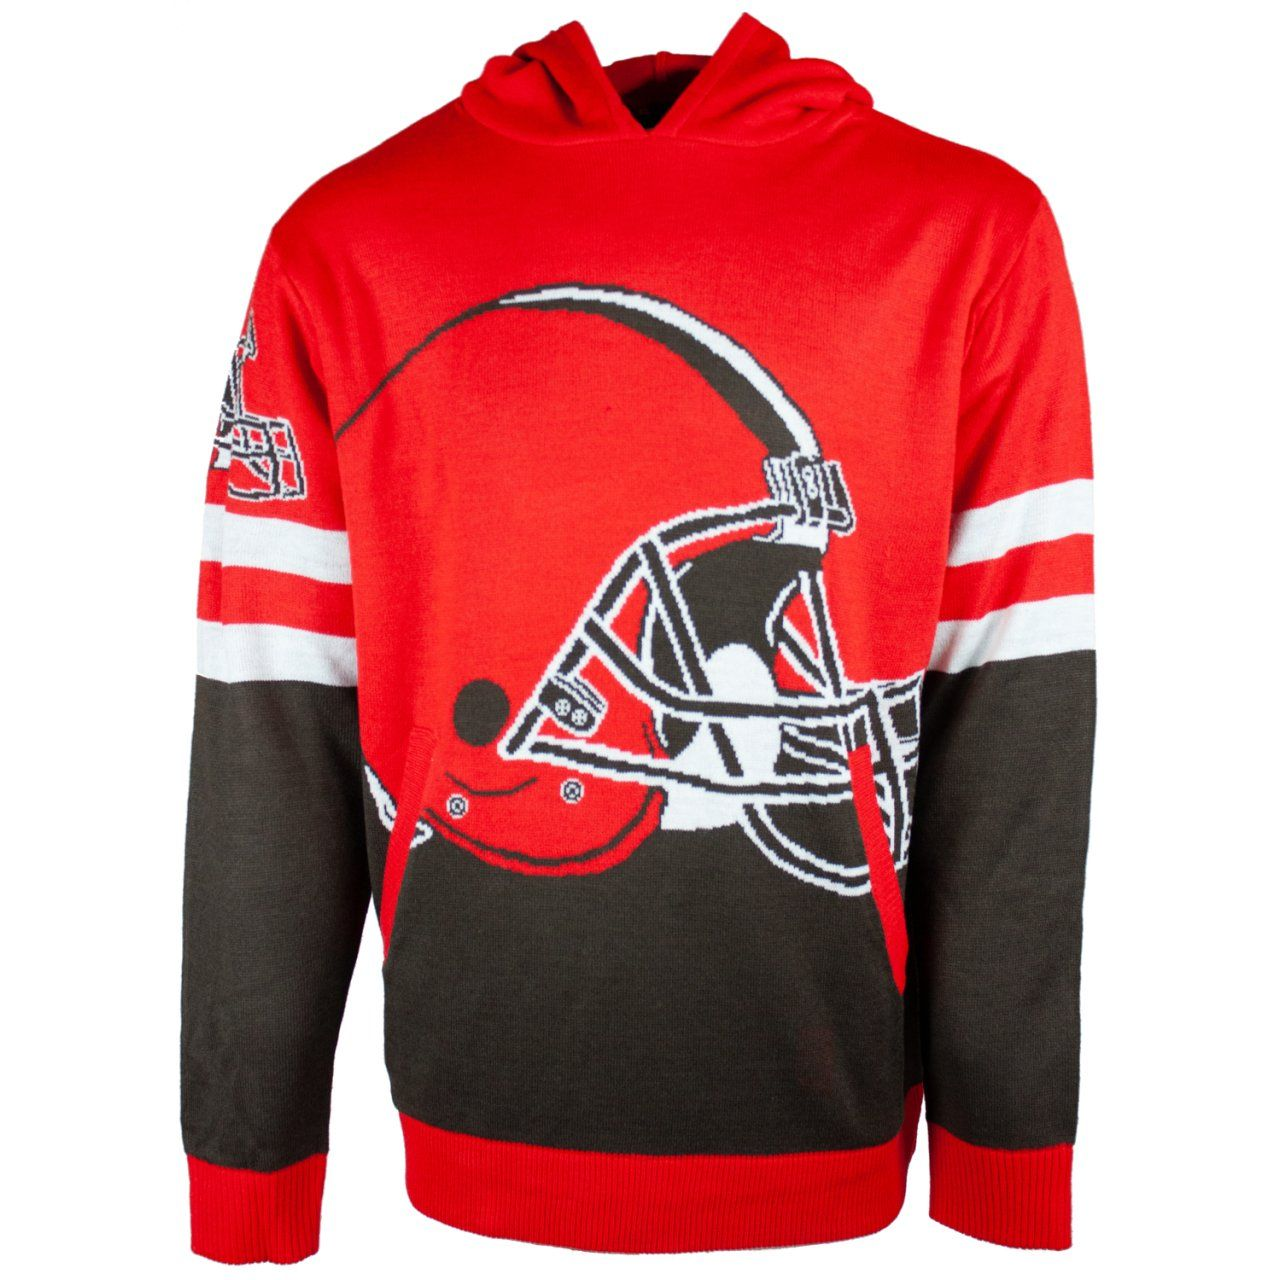 amfoo - NFL Ugly Sweater Big Logo Hoody - Cleveland Browns